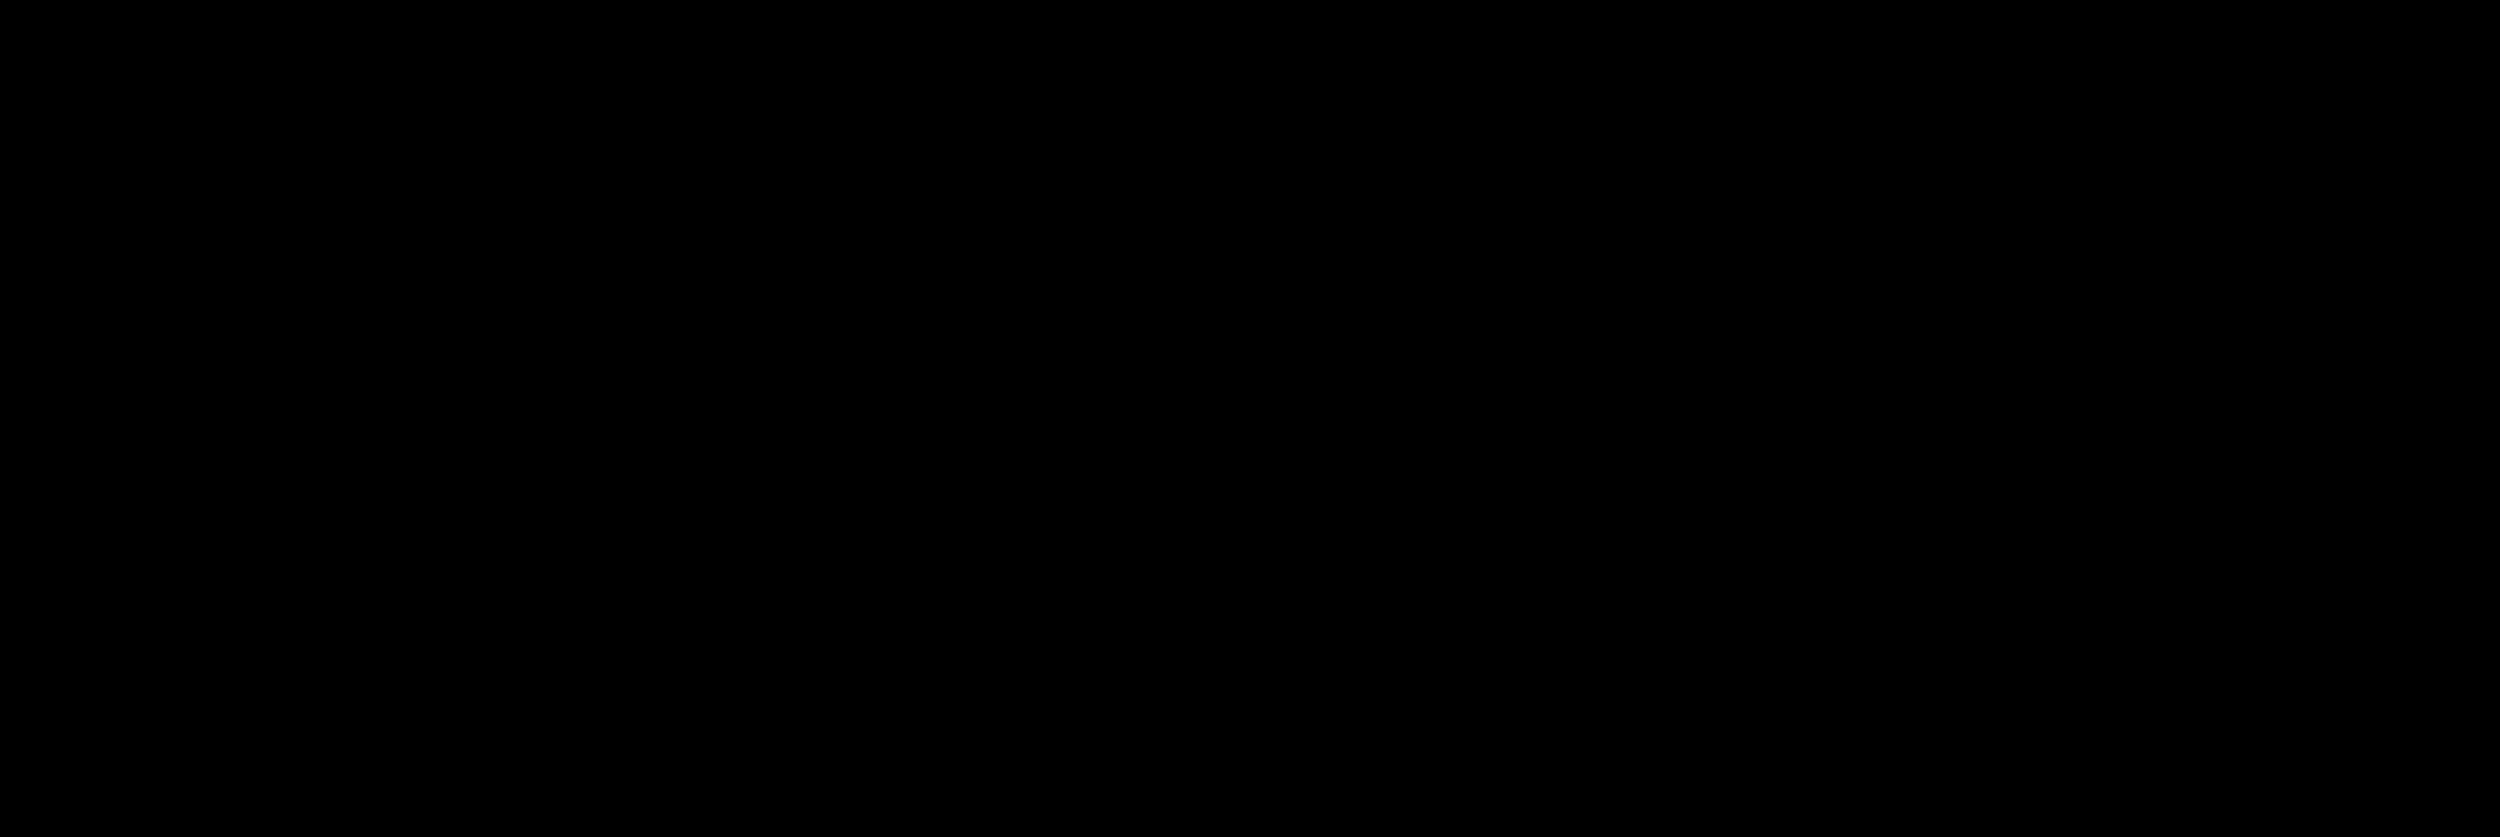 ClaritasCreativeLogos_ClaritasCreative_Logo_Black.png